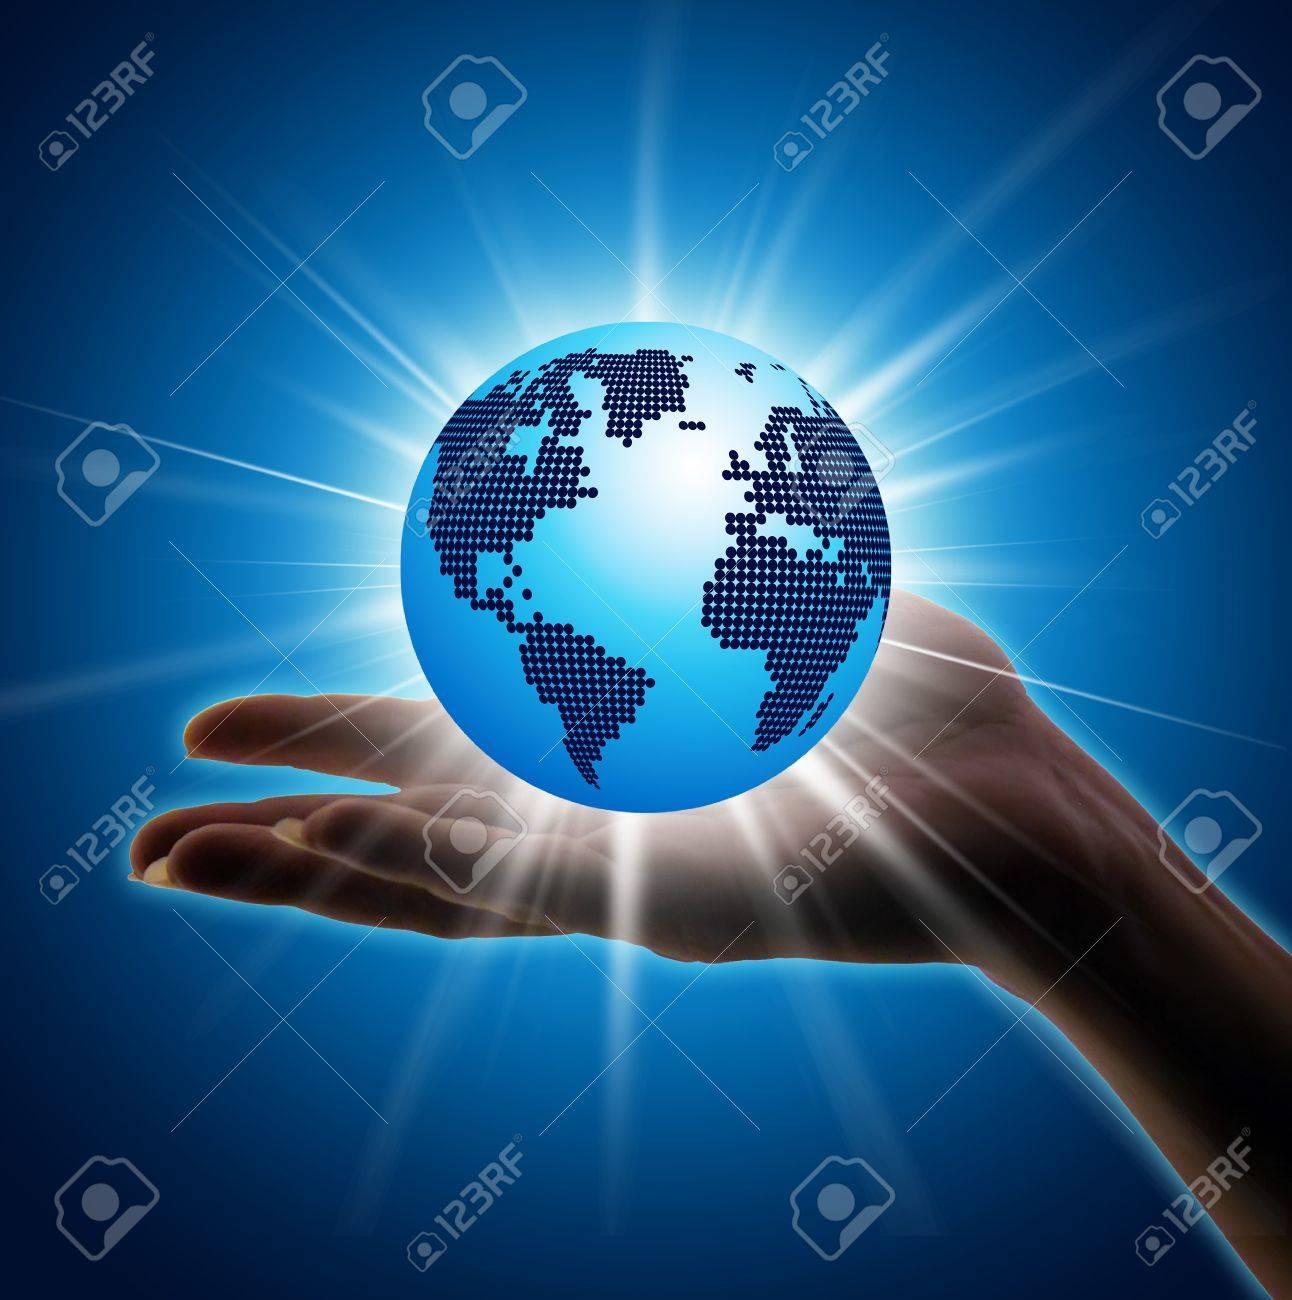 Image of hand holding earth planet against illustration Stock Illustration - 19462821